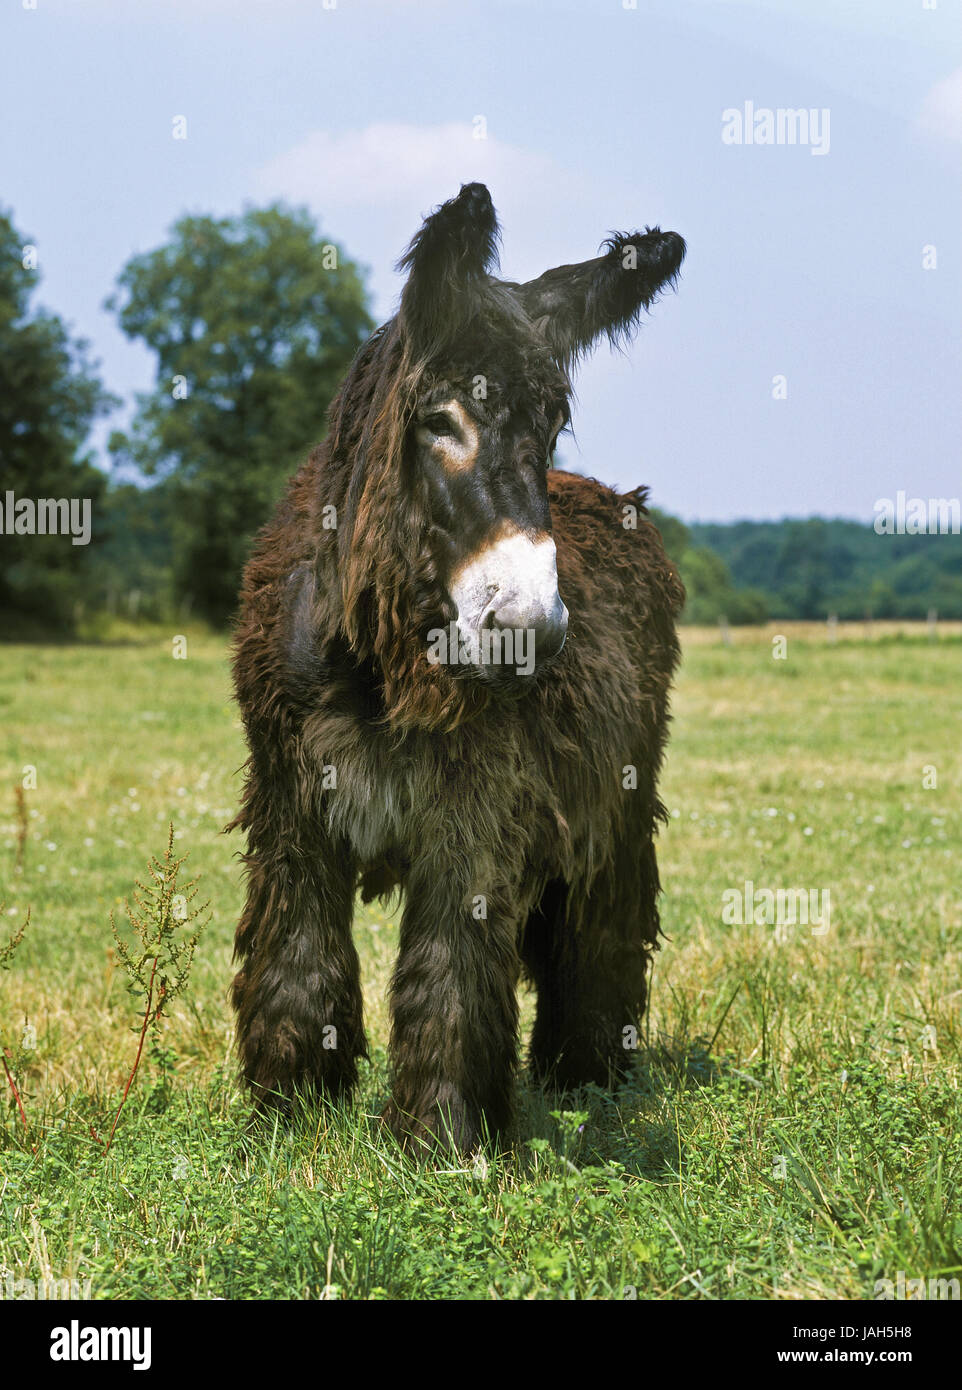 Poitou donkeys or Baudet you Poitou,French race,meadow,stand, - Stock Image